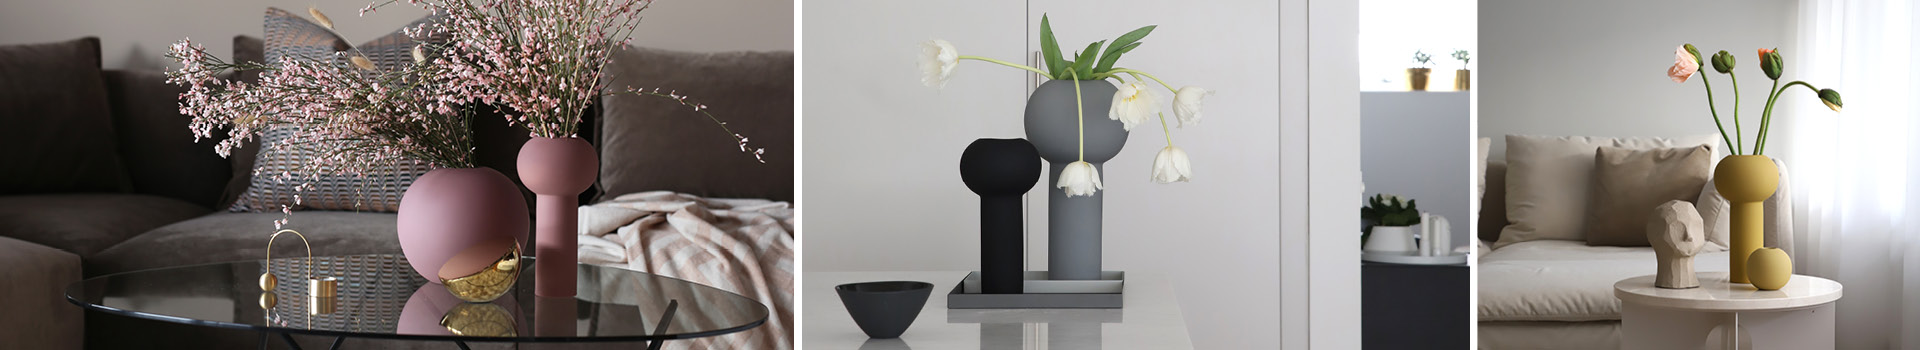 Cooee-Pillar-vase-d.jpg